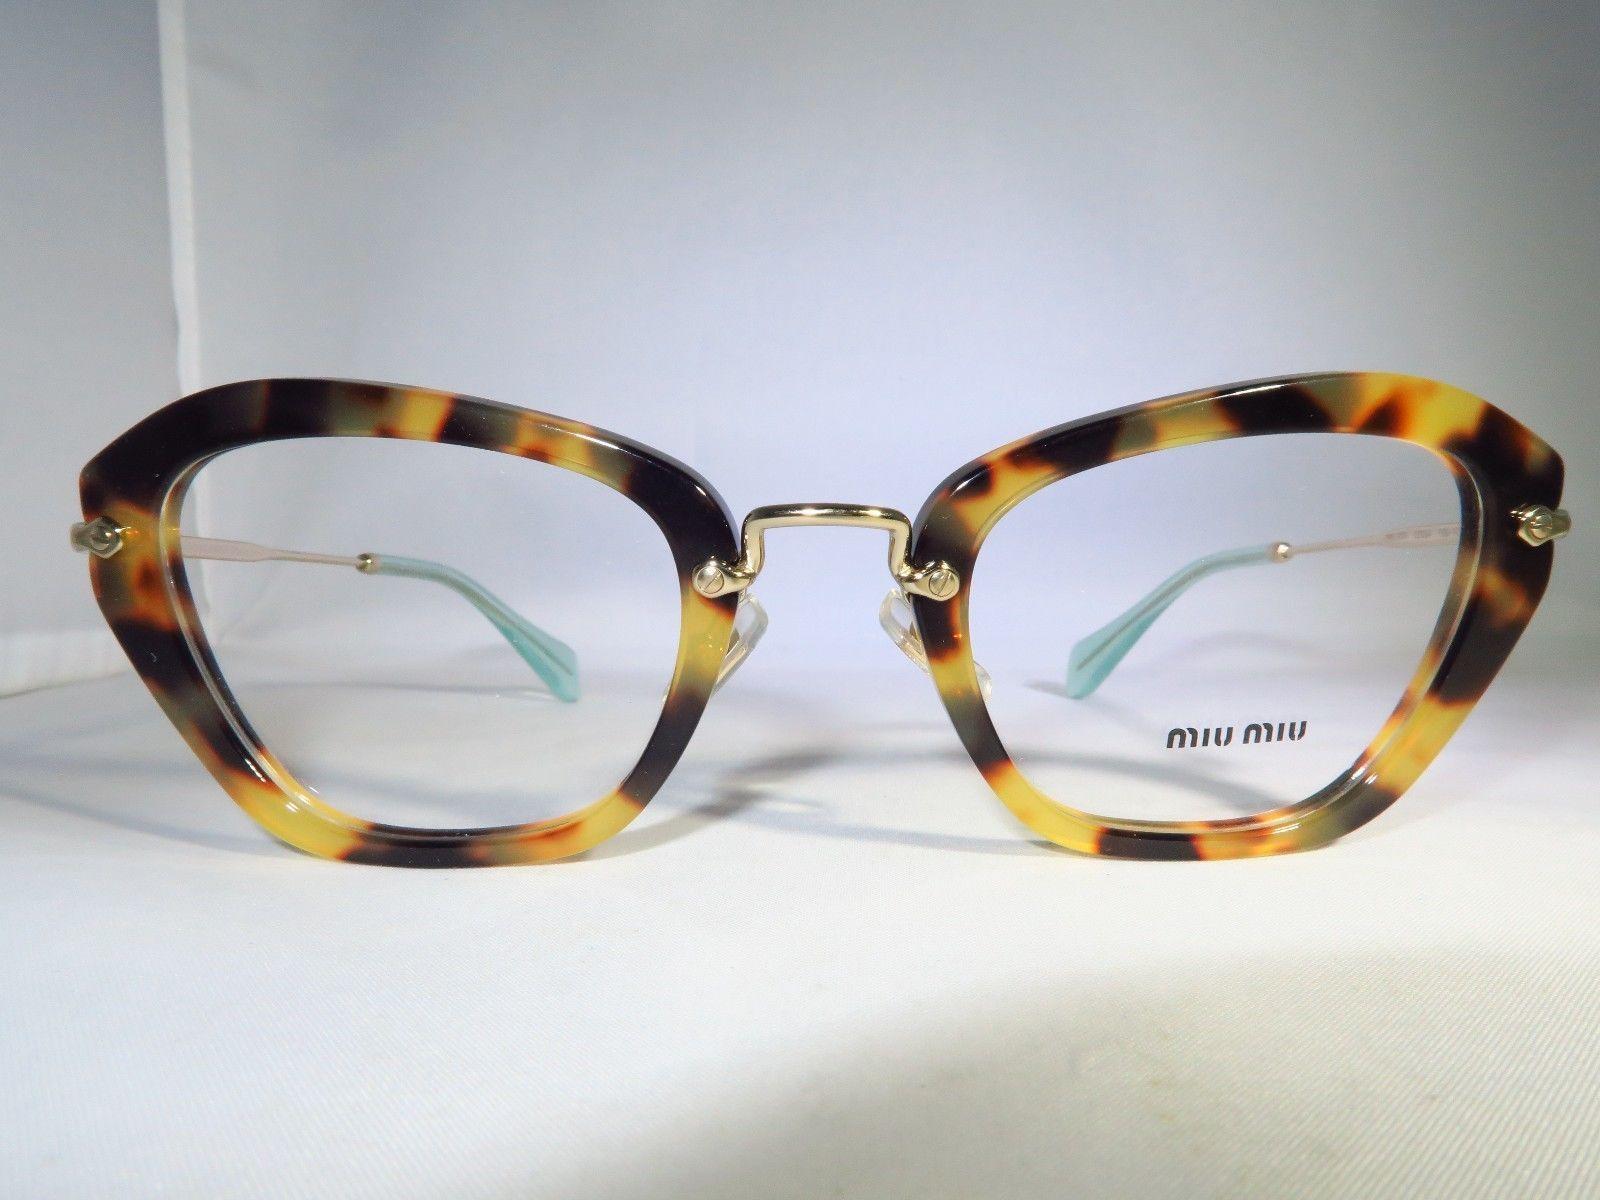 b82e1f54ee5 MIU MIU VMU 05N 7S0 1O1 Spotted Tortoise New Women Eyeglasses 50mm 24mm  140mm